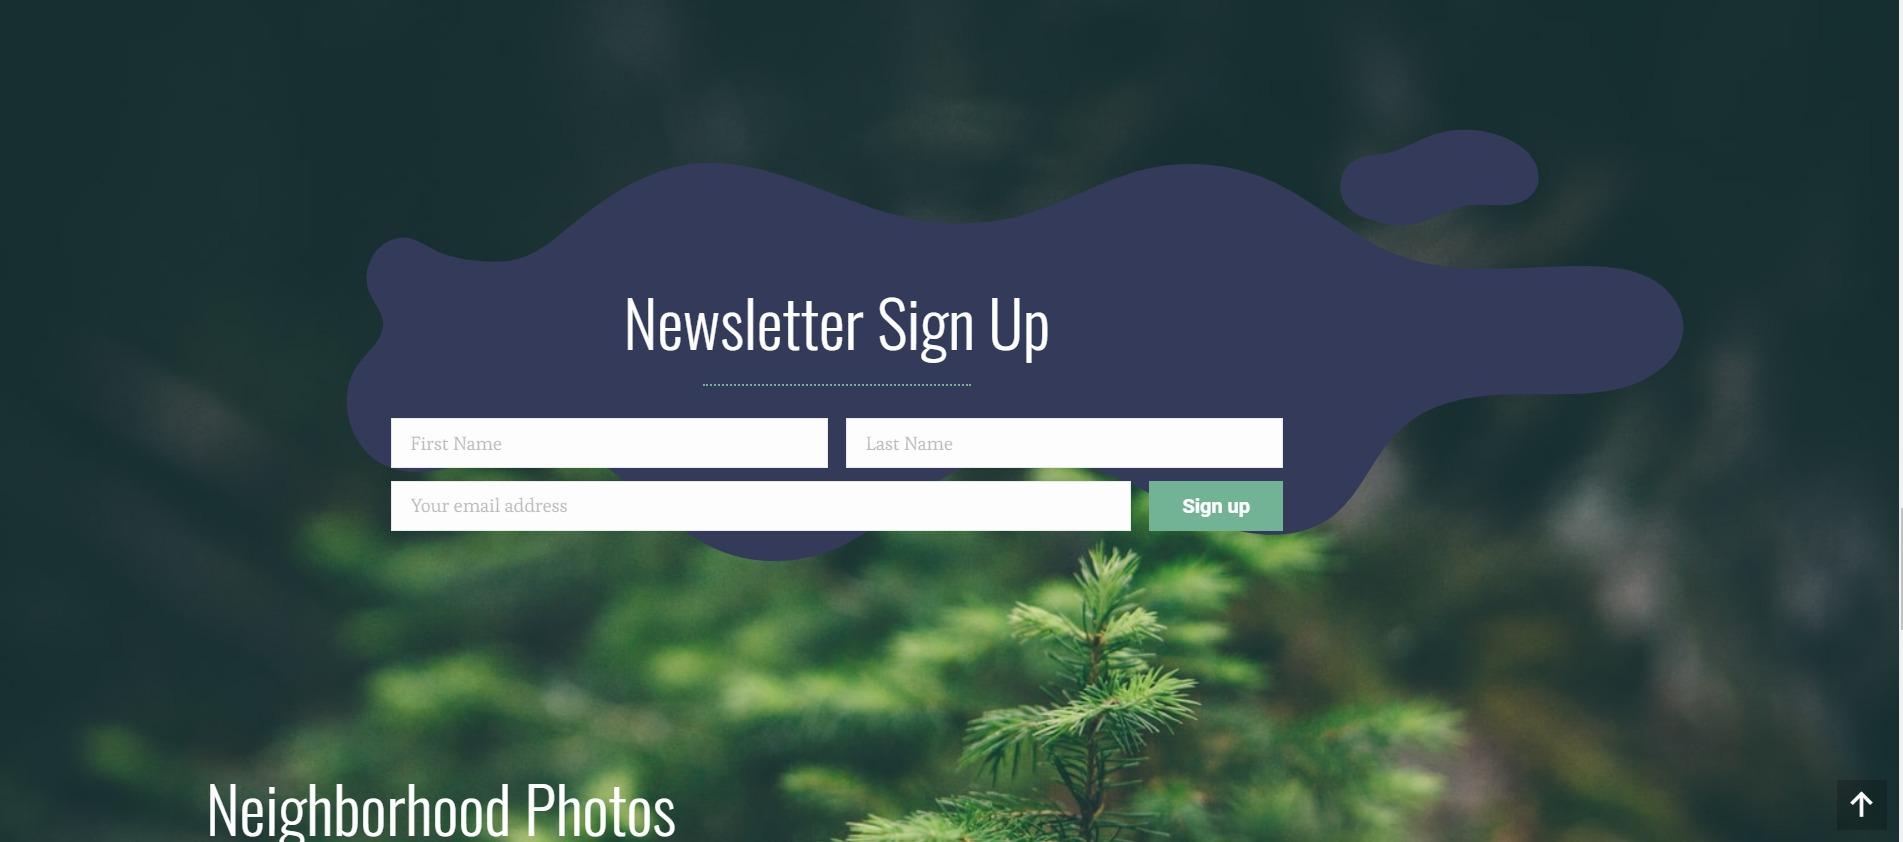 Custom SVG - WordPress Website - Web Design - Norfolk Web Development